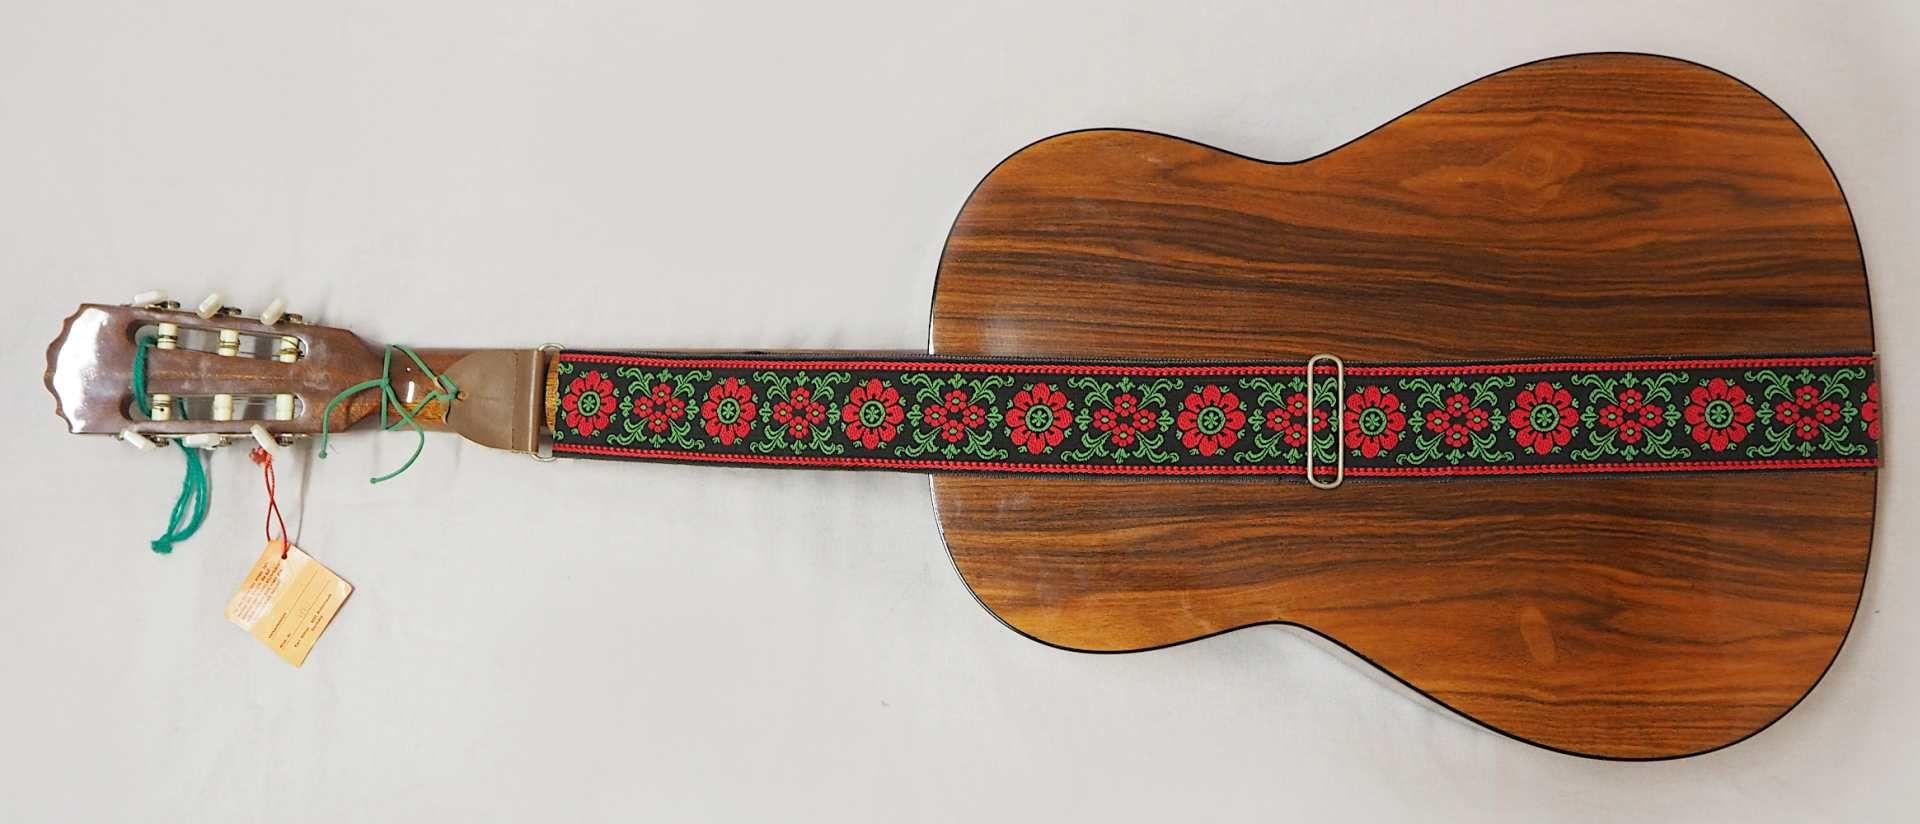 1 Konzert-Gitarre HÖFNER Modellnummer: 4840, wohl z.T. Rosenholz min. intarsiert auf - Bild 8 aus 8